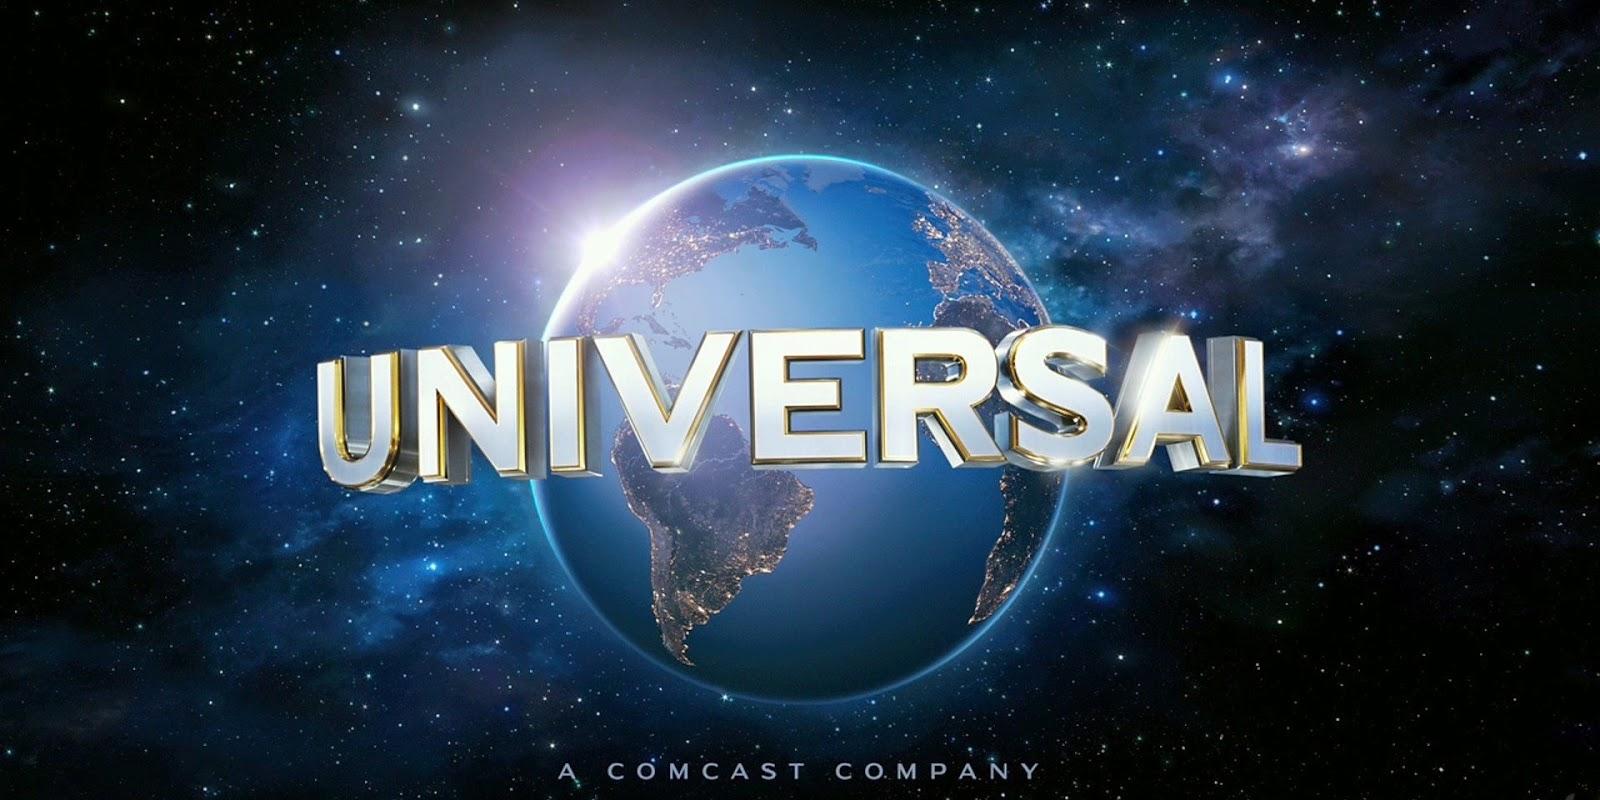 Universal Pictures adia WarCraft, Círculo de Fogo 2 e reinicio A Múmia